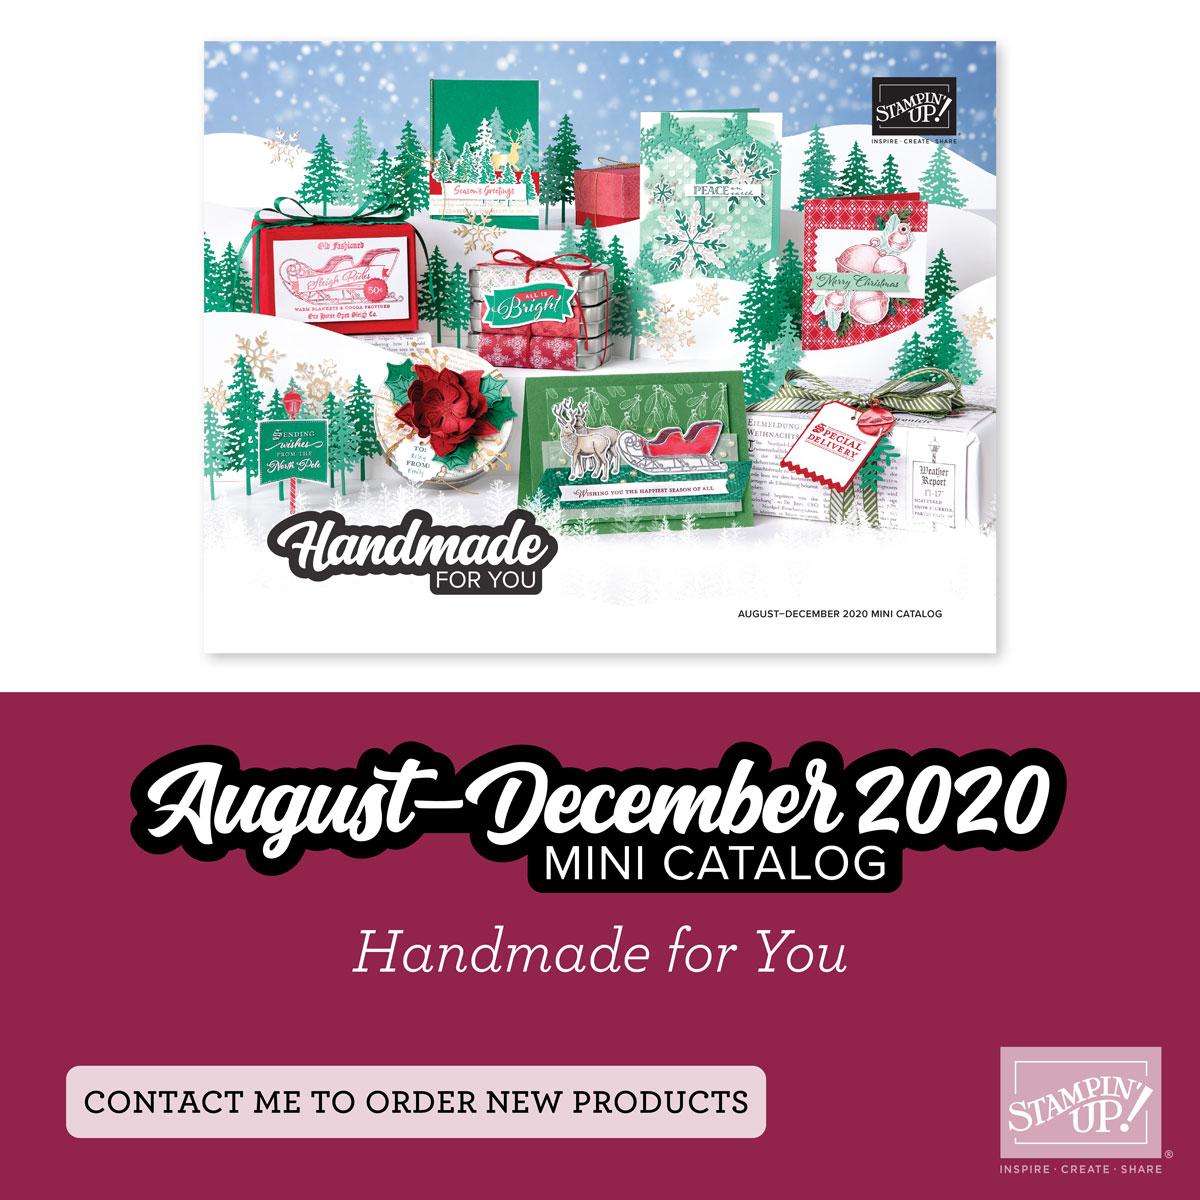 August-December Mini Catalog